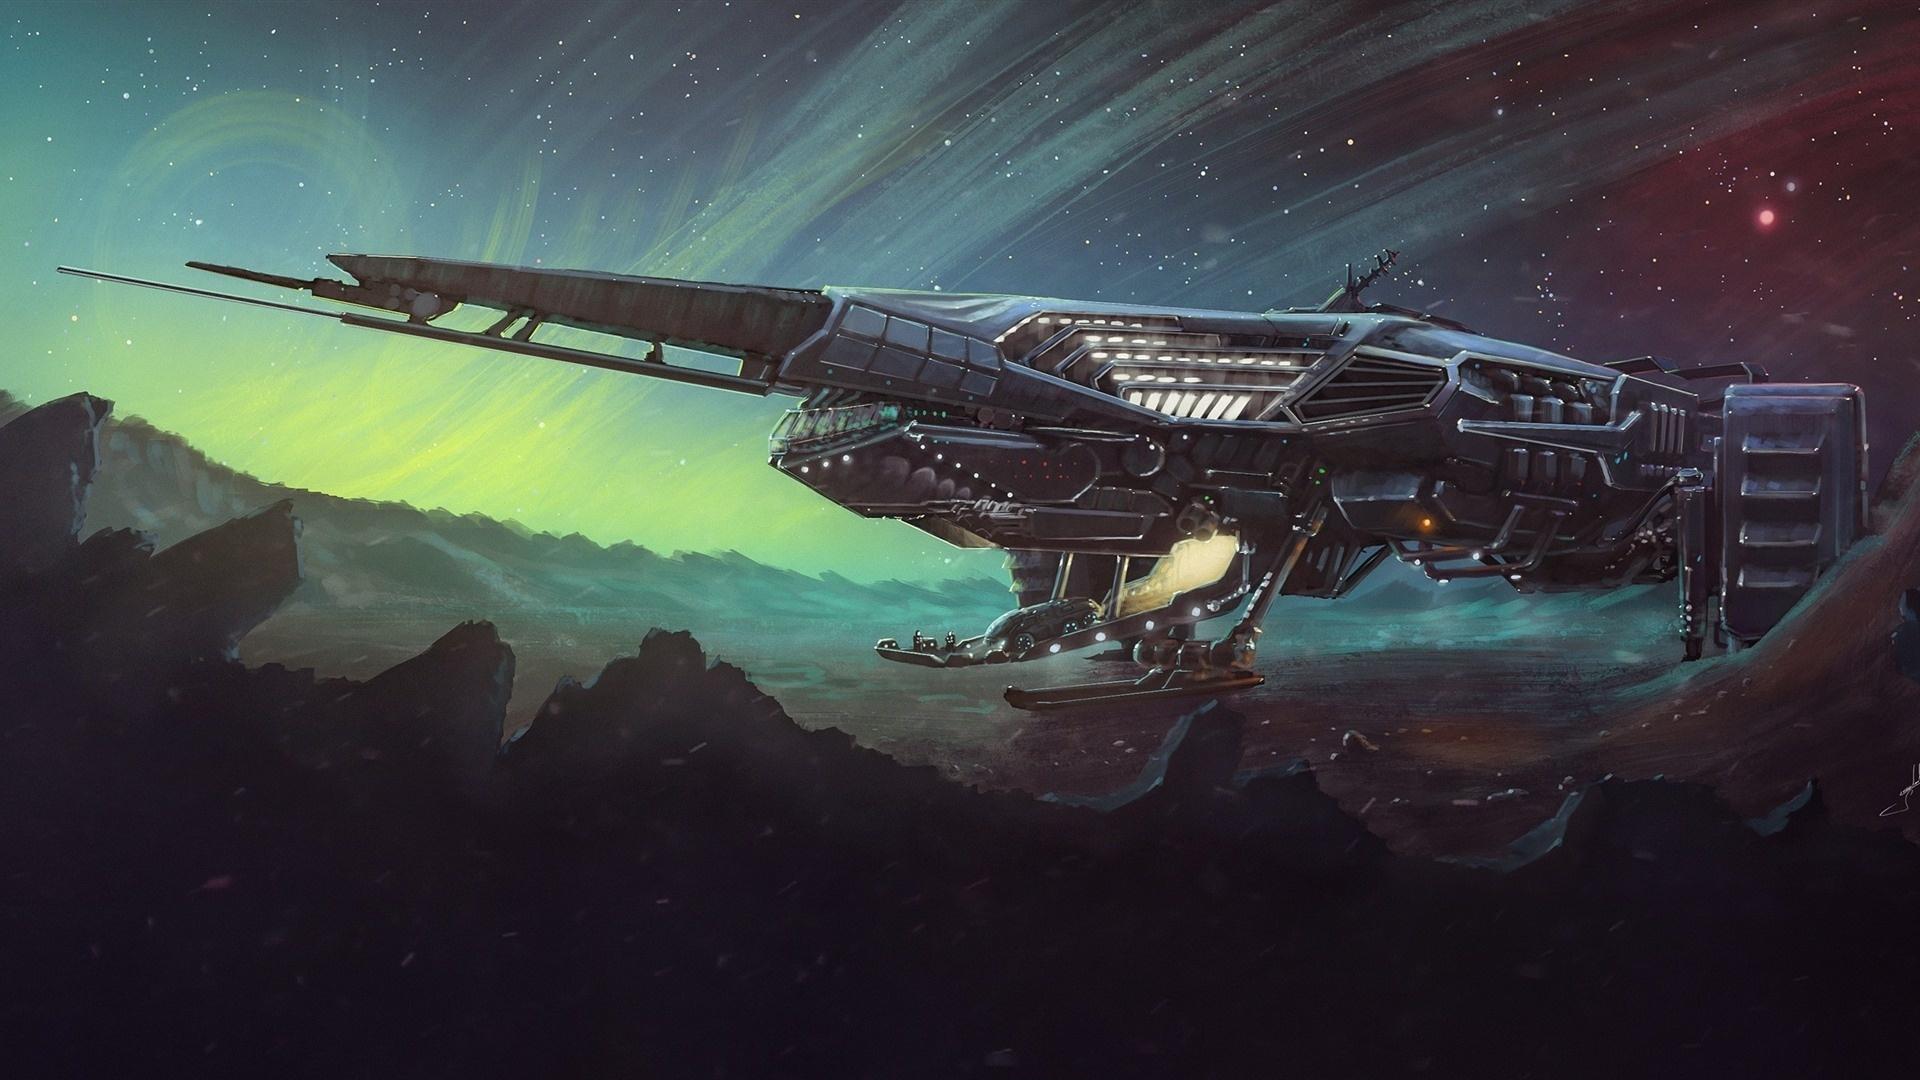 Spaceships Art Wallpaper theme